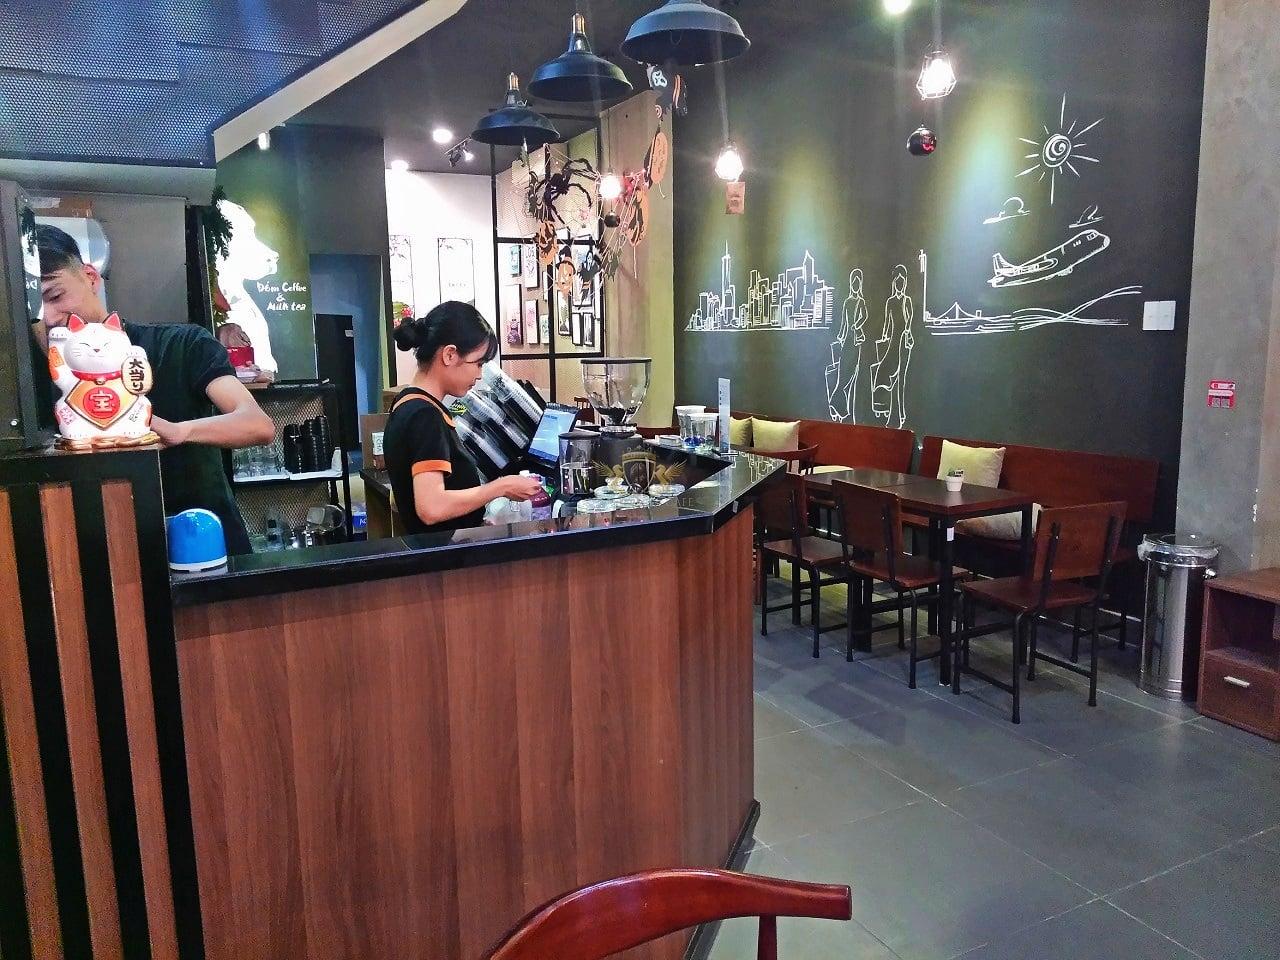 Dom Cafe Go Vap mua ban may pha cafe chuyen nghiep cua y Faema E98 RE A2 HC600 khoi nghiep cafe 9